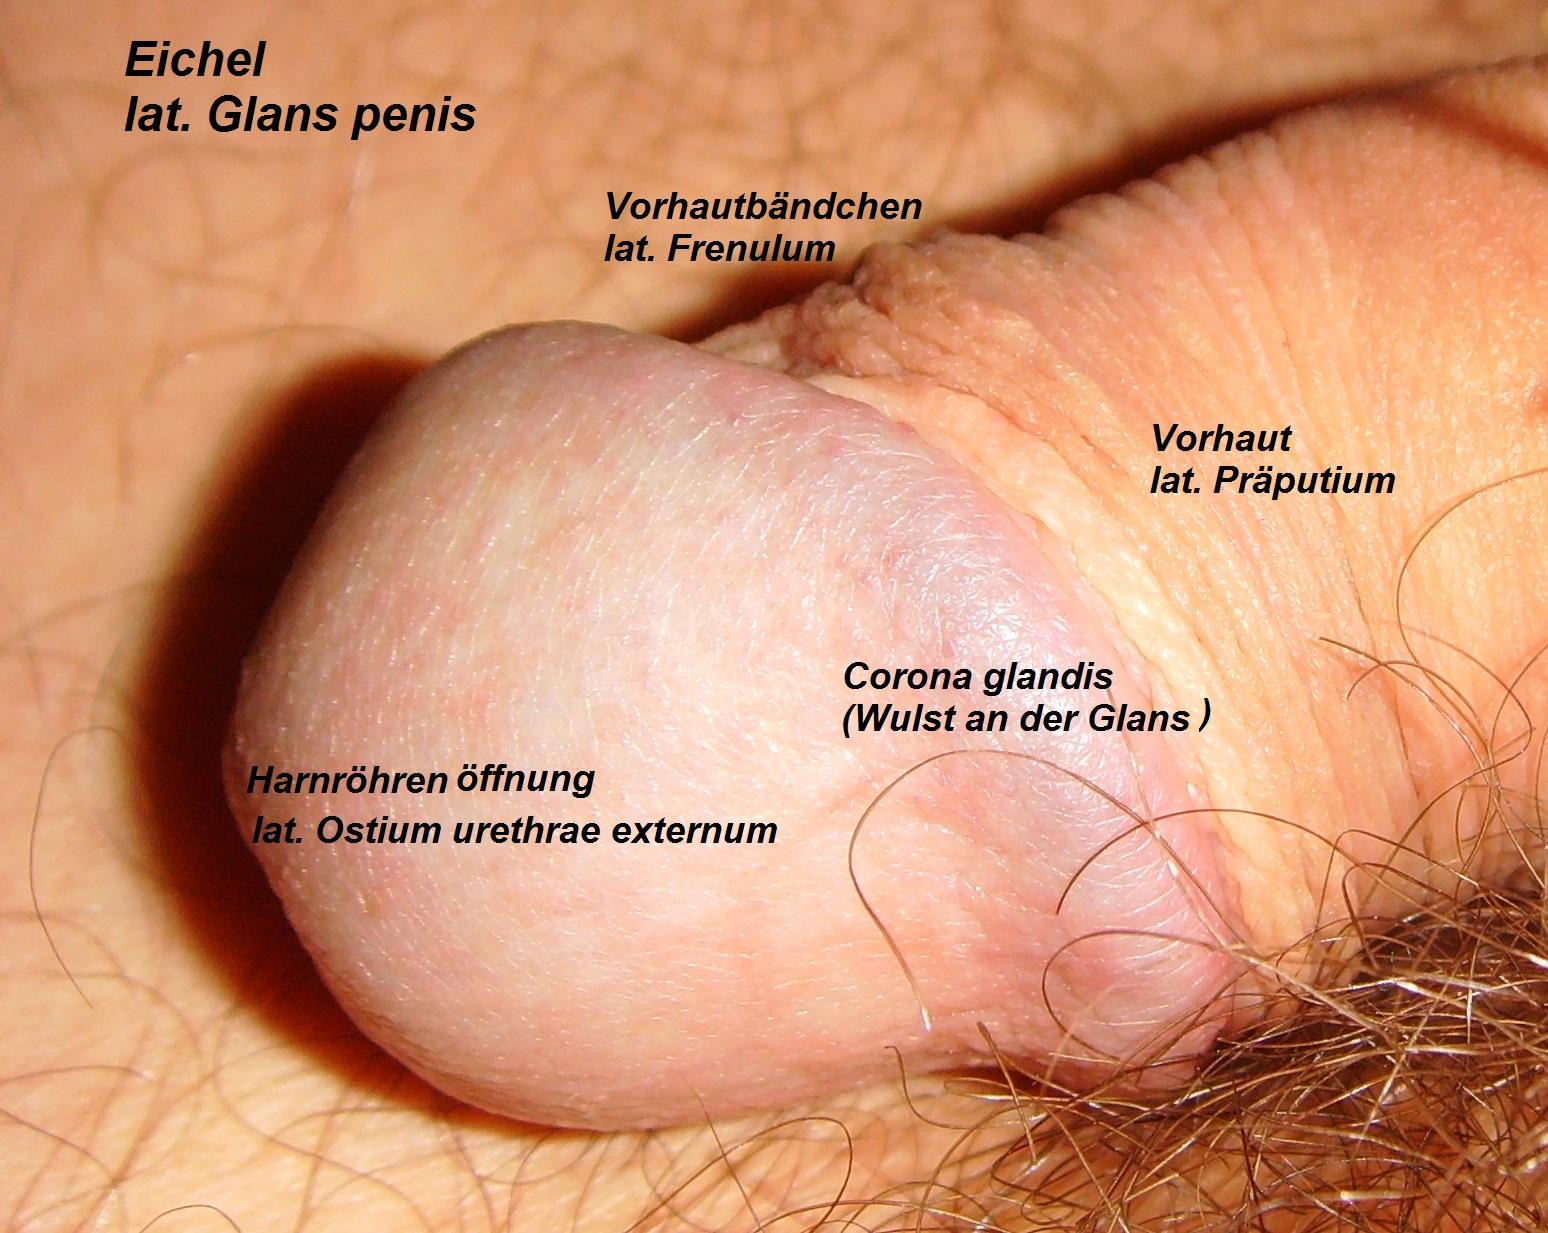 Normal penis glans